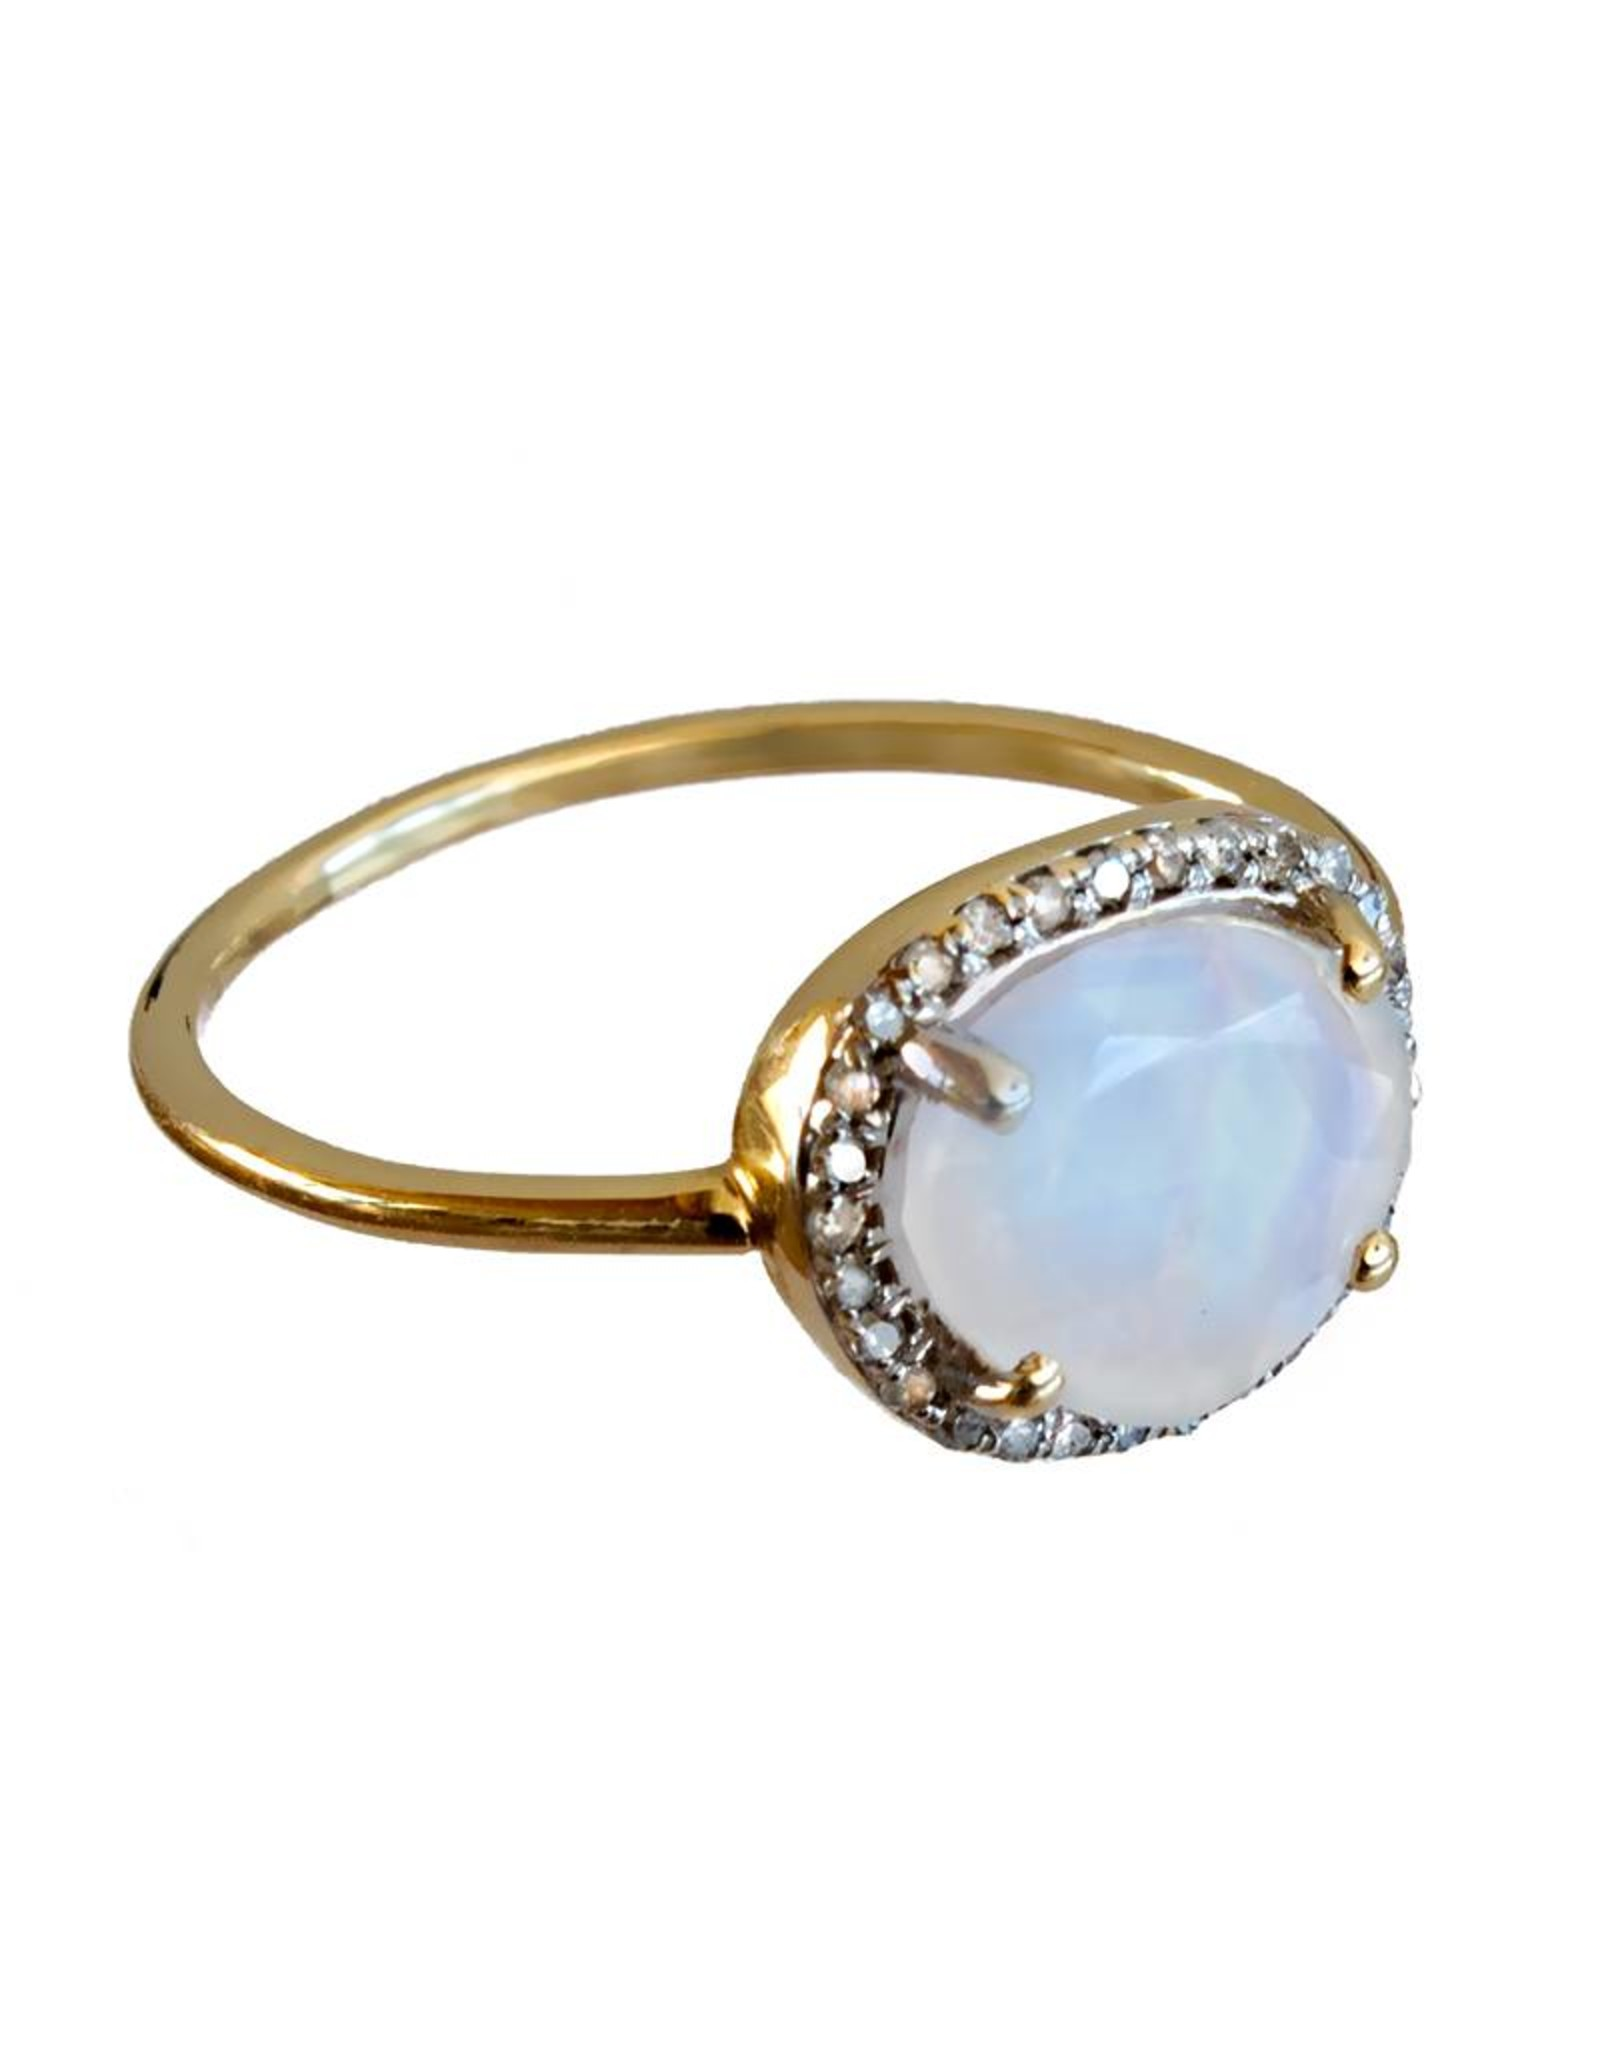 Bo Gold Ring - Gold - Moonstone - Diamonds